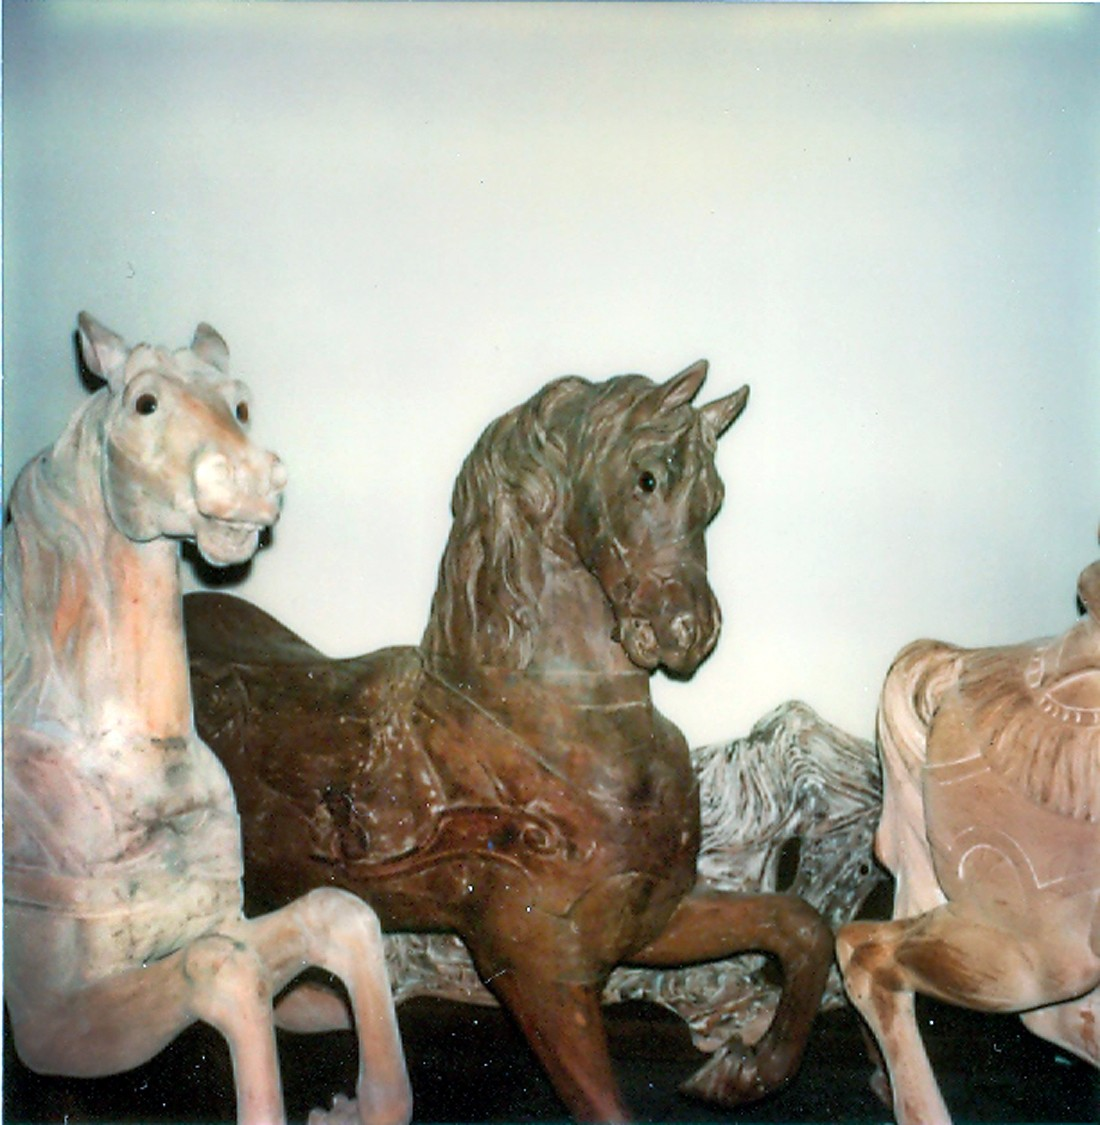 Fraley-Redbug-Studio-carousel-restoration-1980-visit-Dentzel-horse